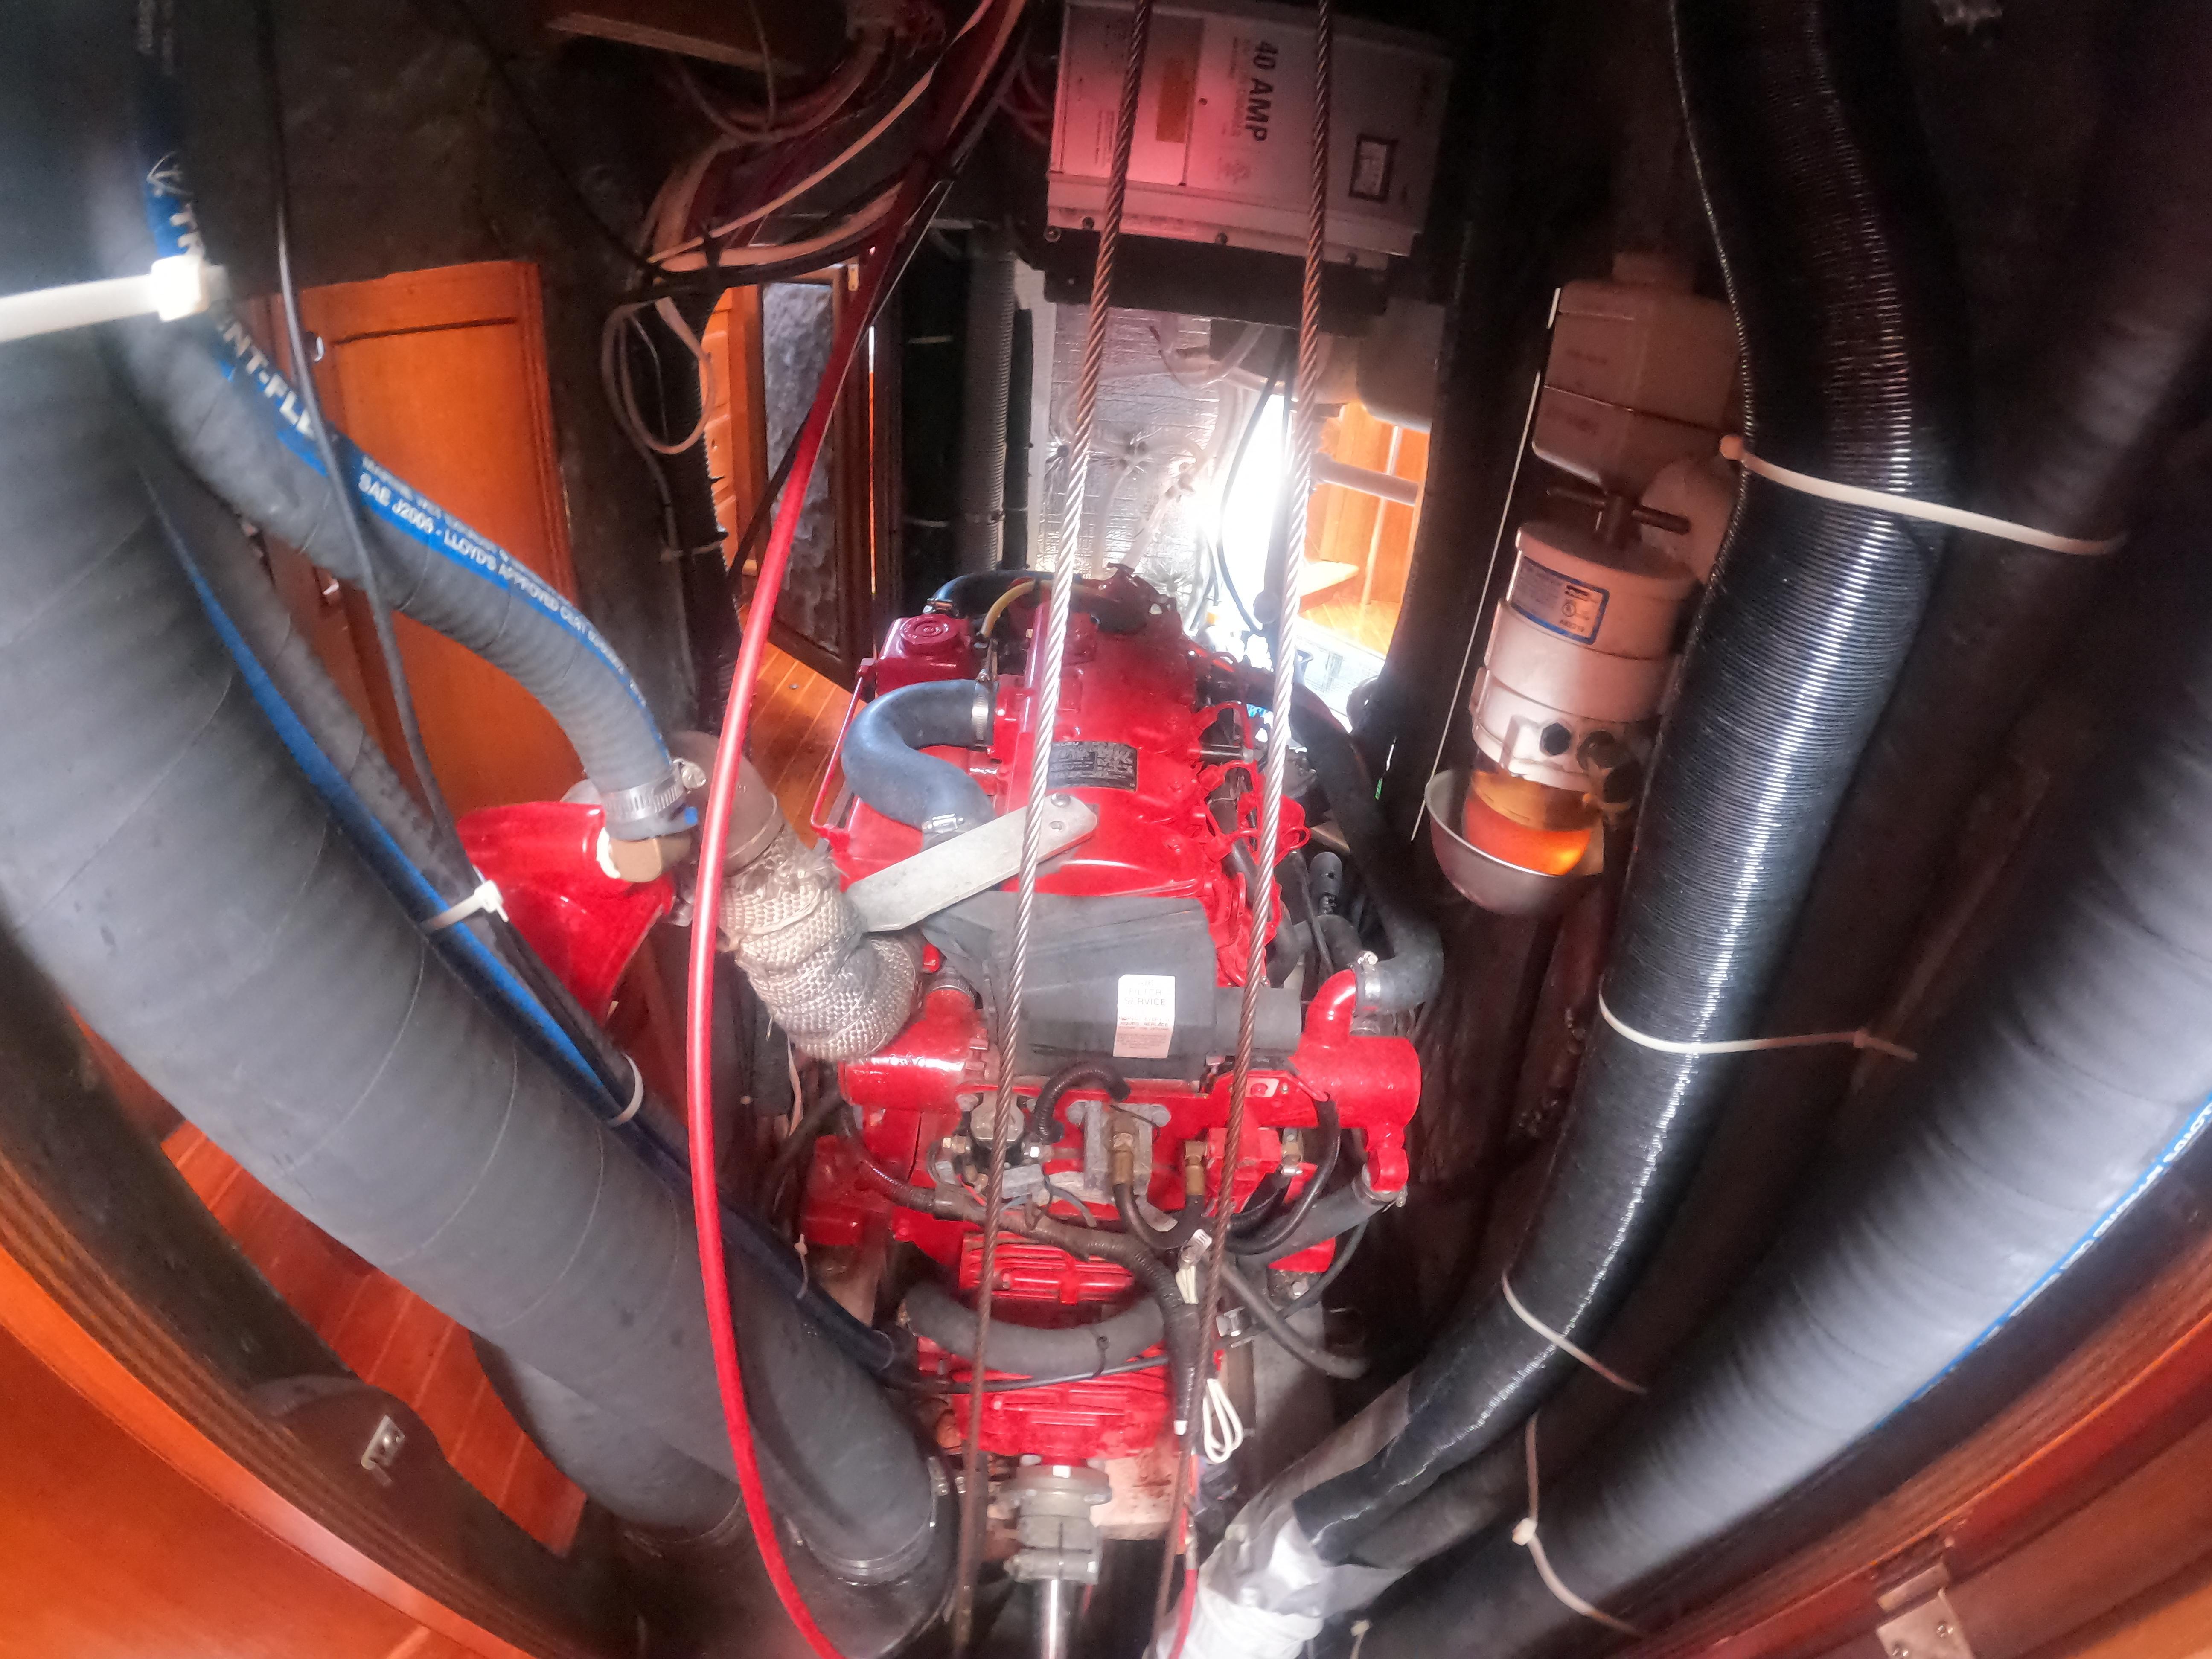 Aft Engine Access